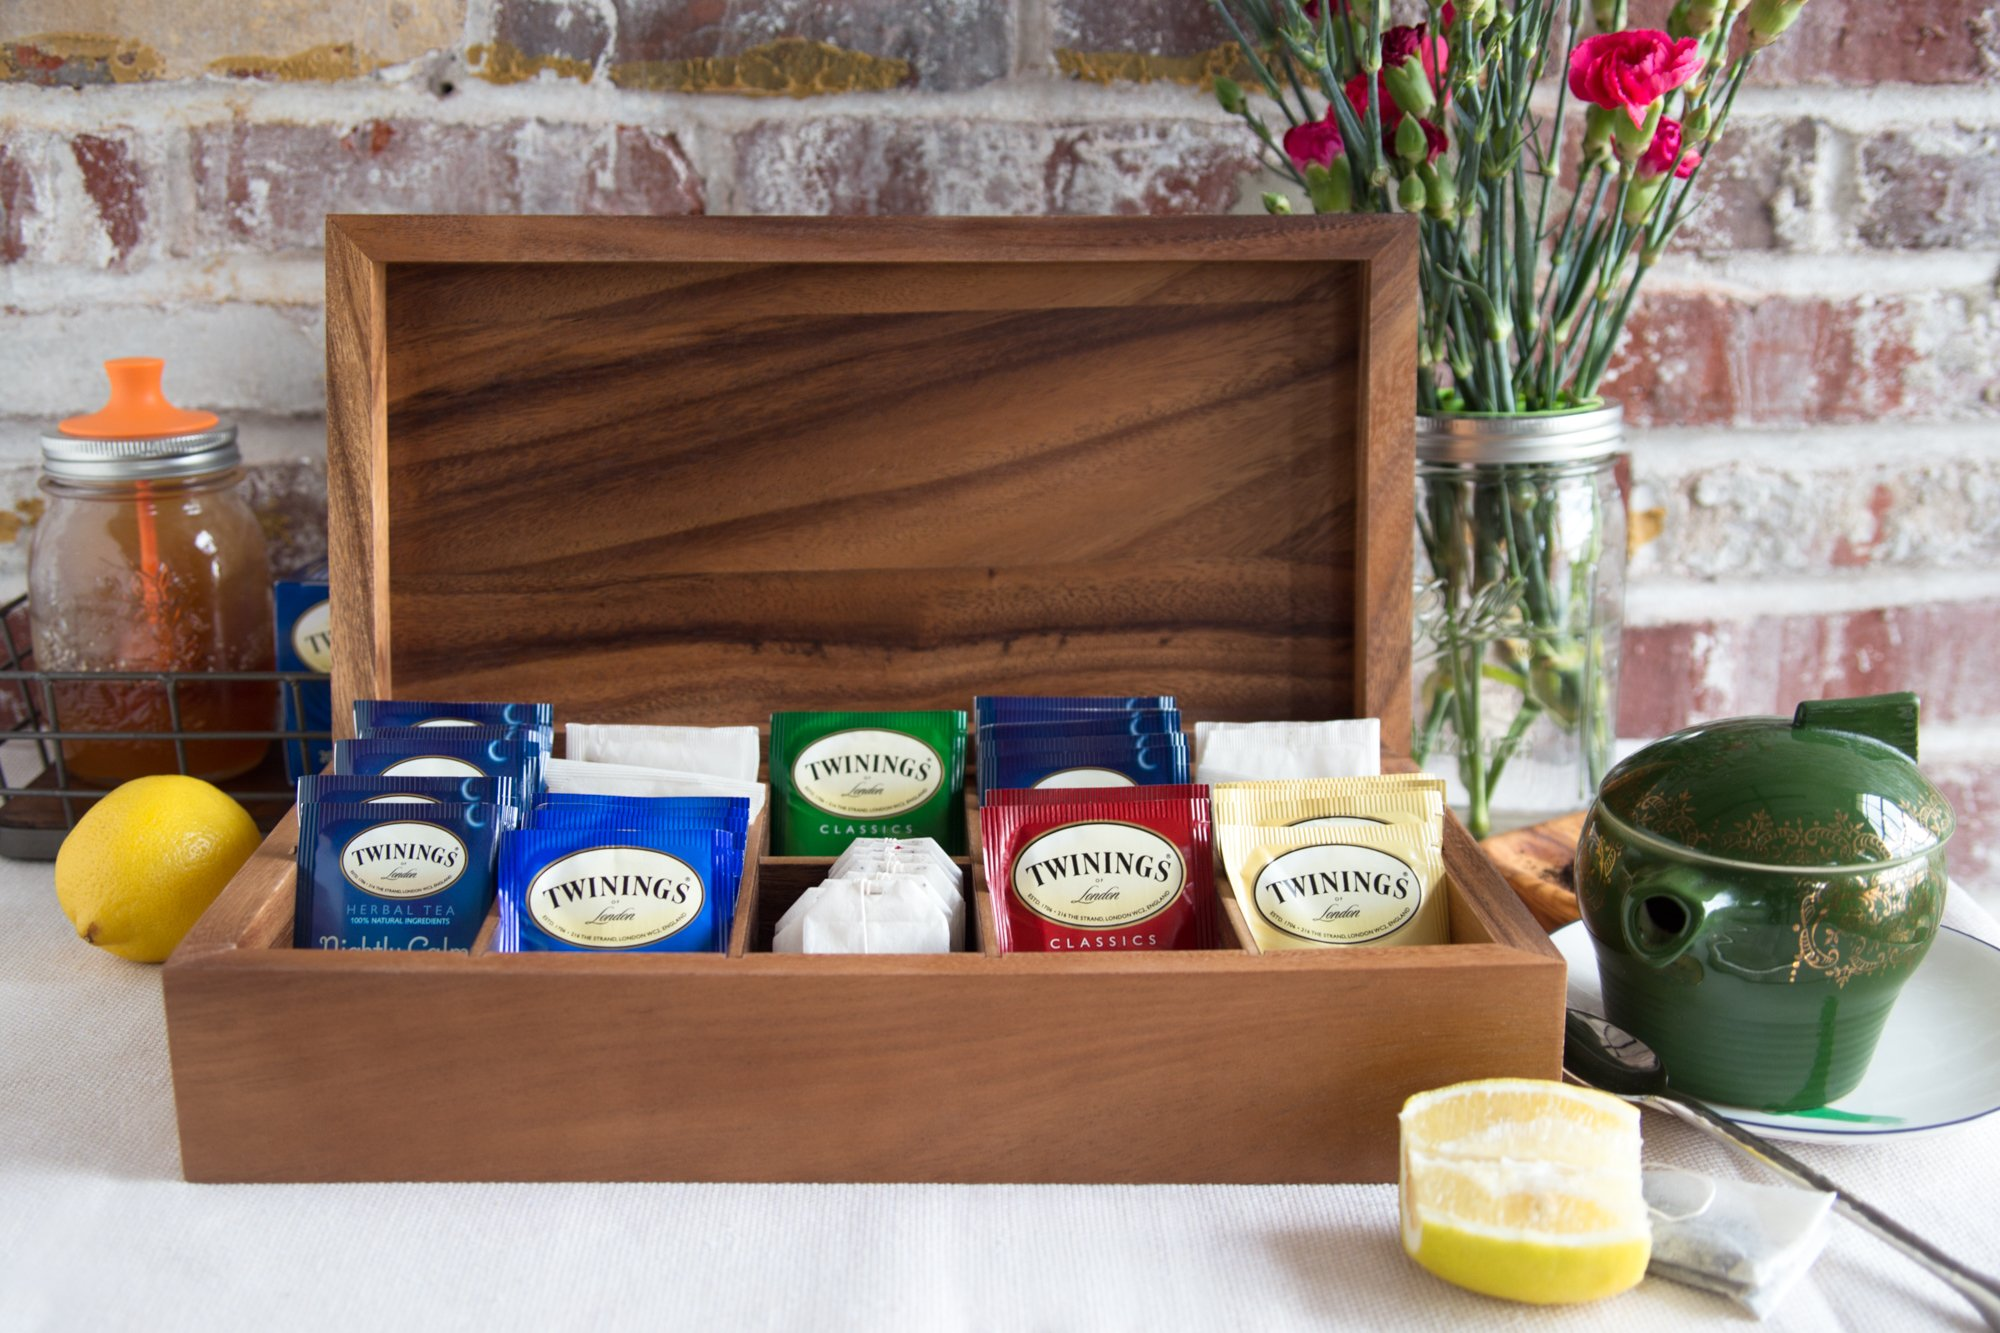 Ironwood Gourmet 28142 Rectangular Vauxhall Double Tea Box, Acacia Wood by Ironwood Gourmet (Image #7)